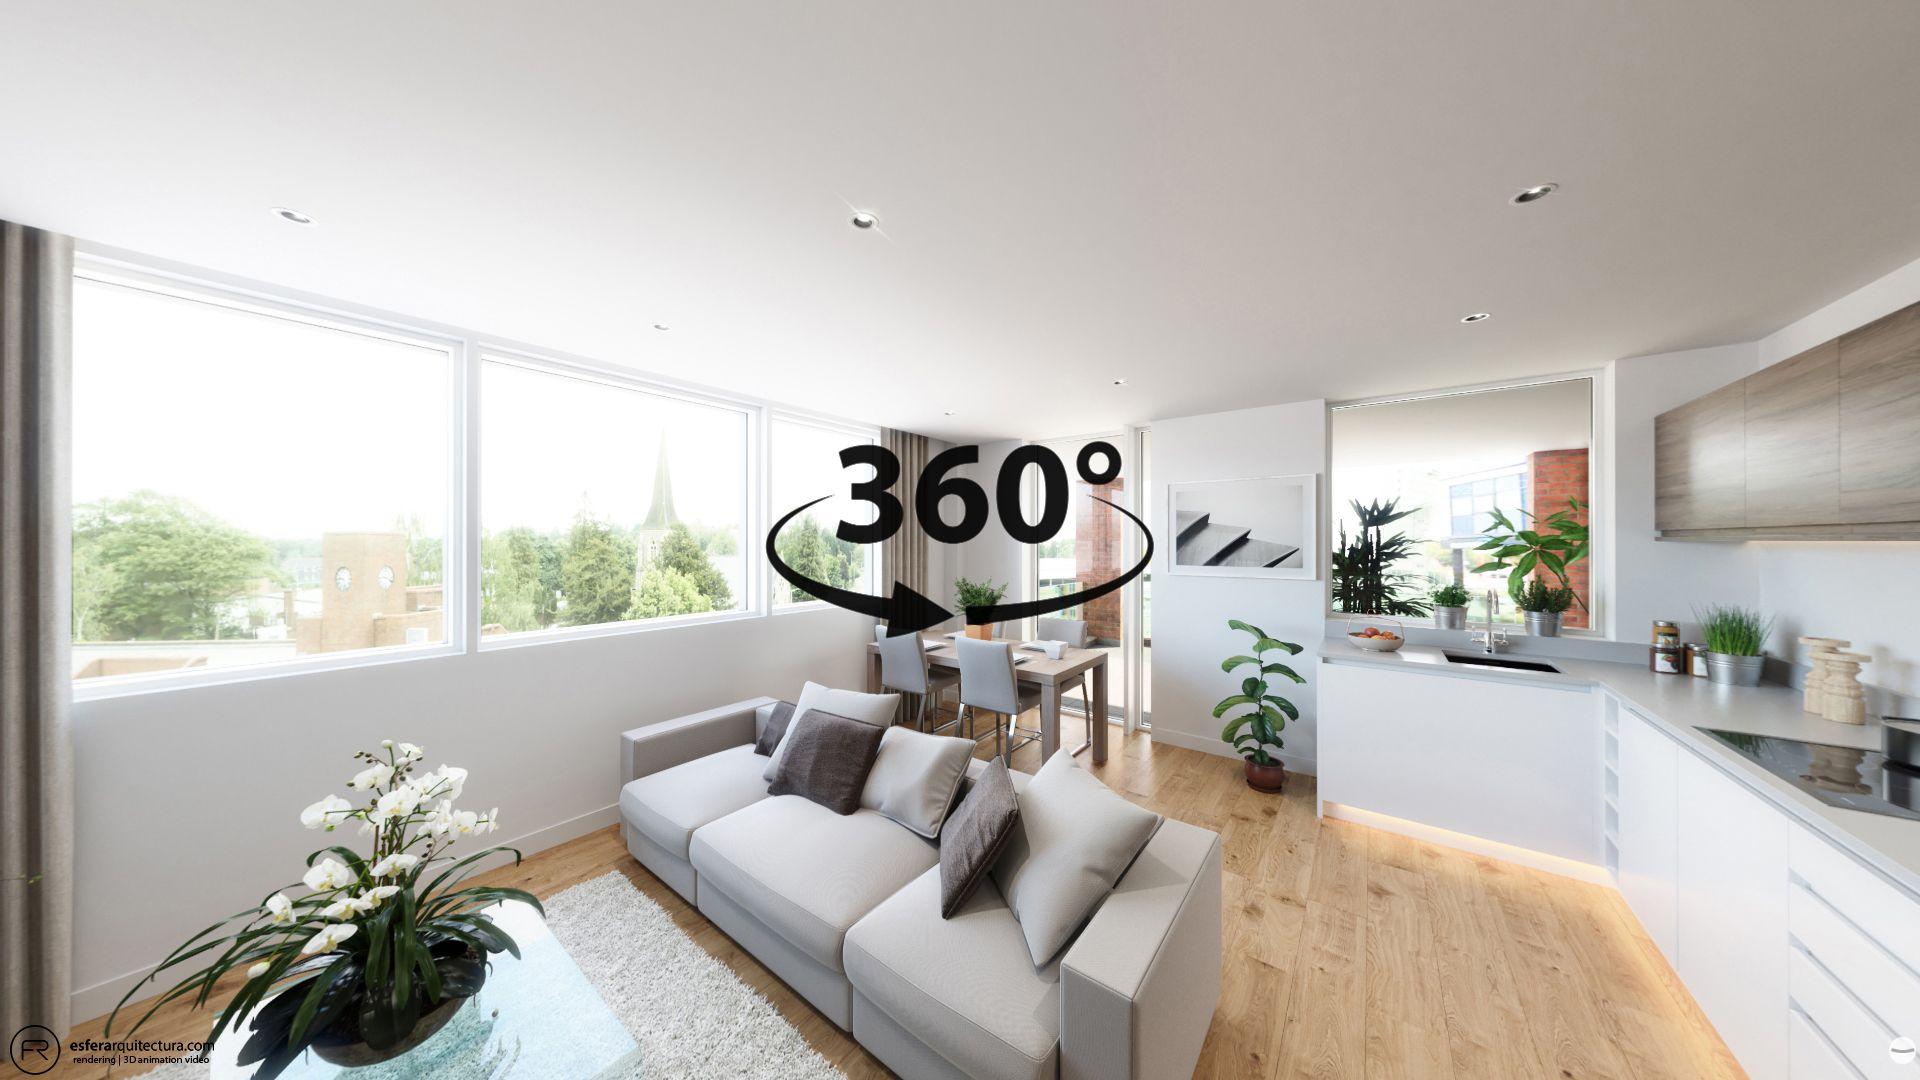 Tour Virtual 360 Edificio De Viviendas En Londres Esferarquitectura